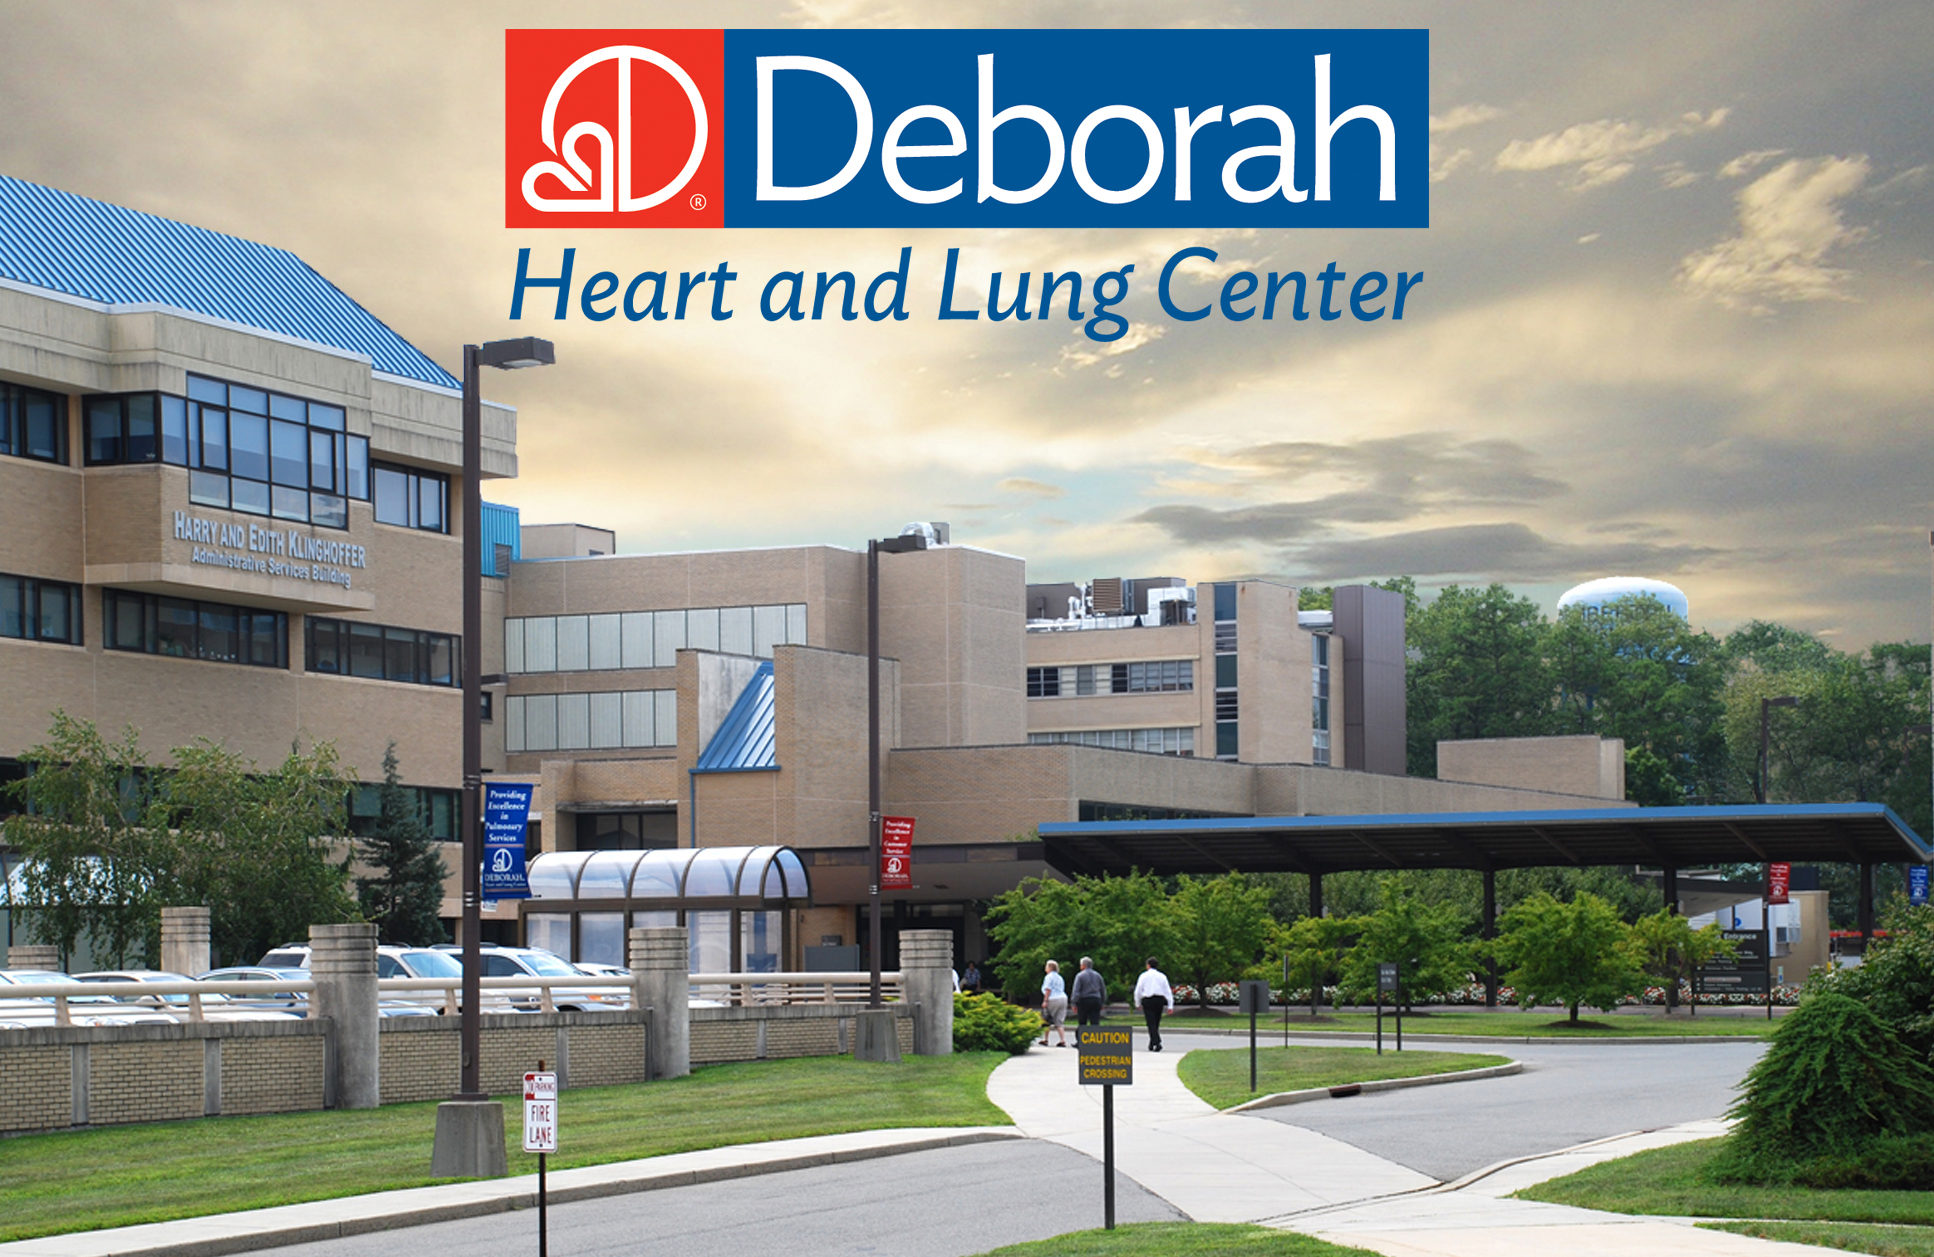 Deborah heart hospital